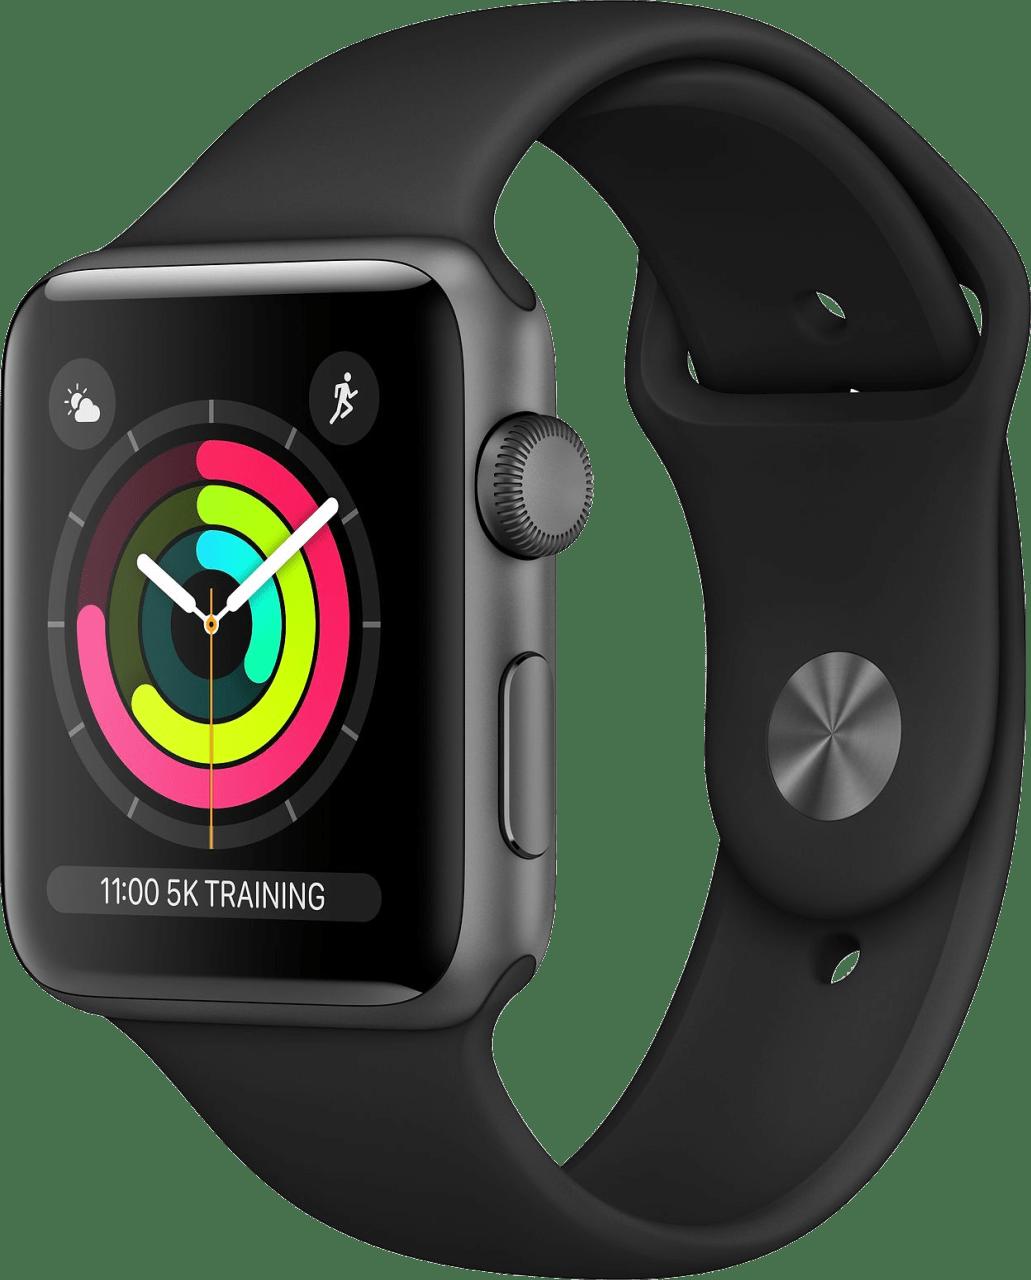 Schwarz Apple Watch Series 3 GPS, 38mm.2